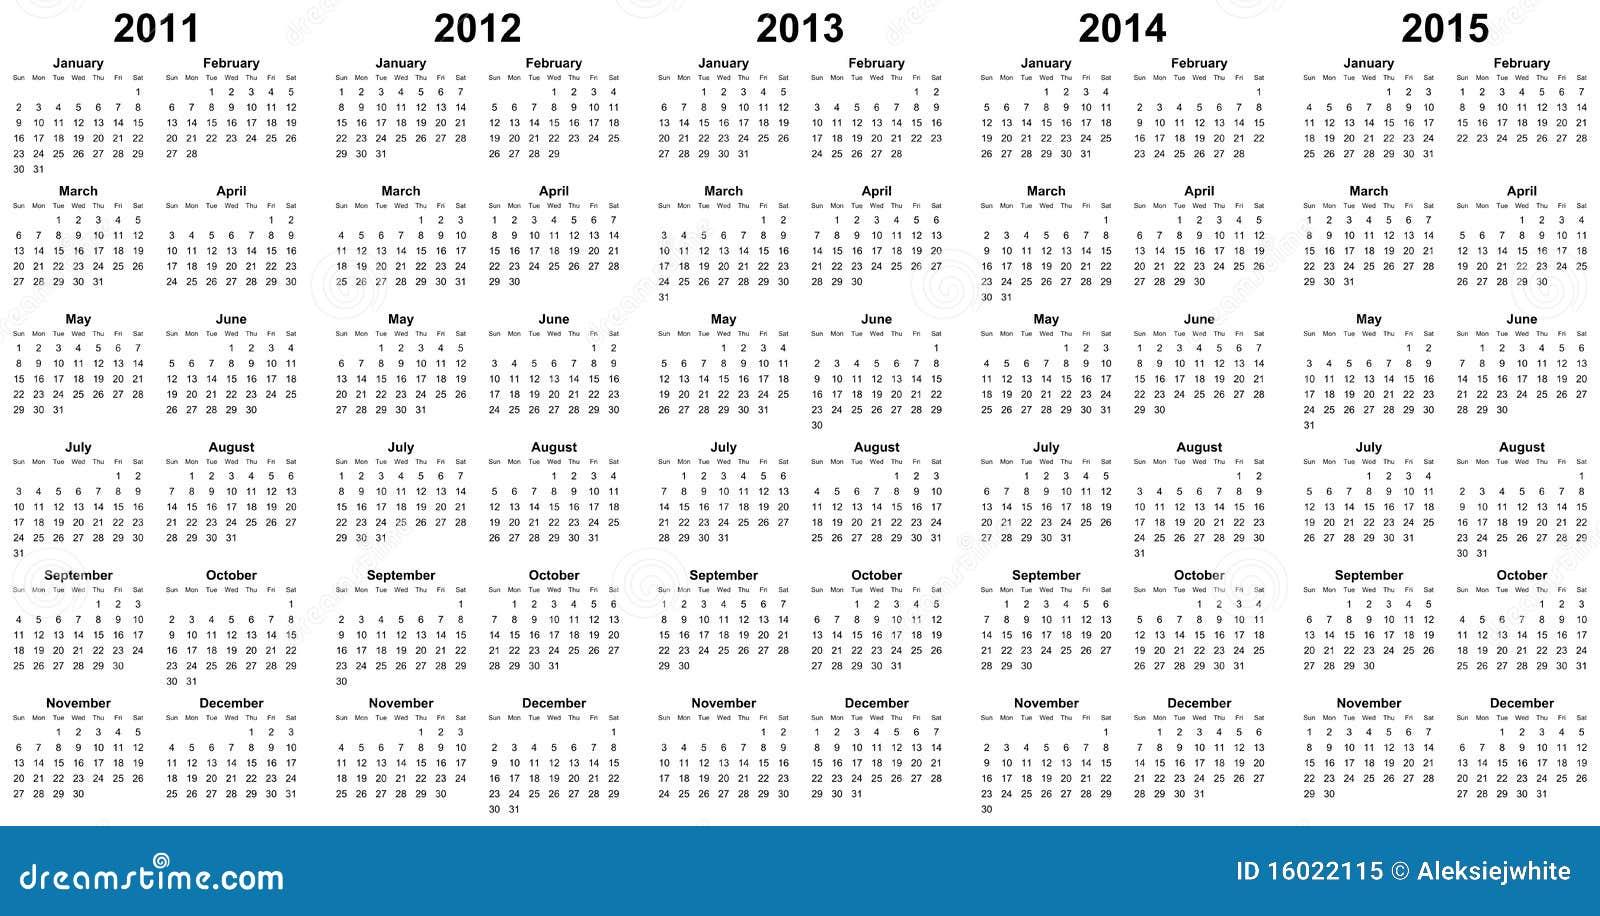 school calendars 2014 2015 as free printable word templates